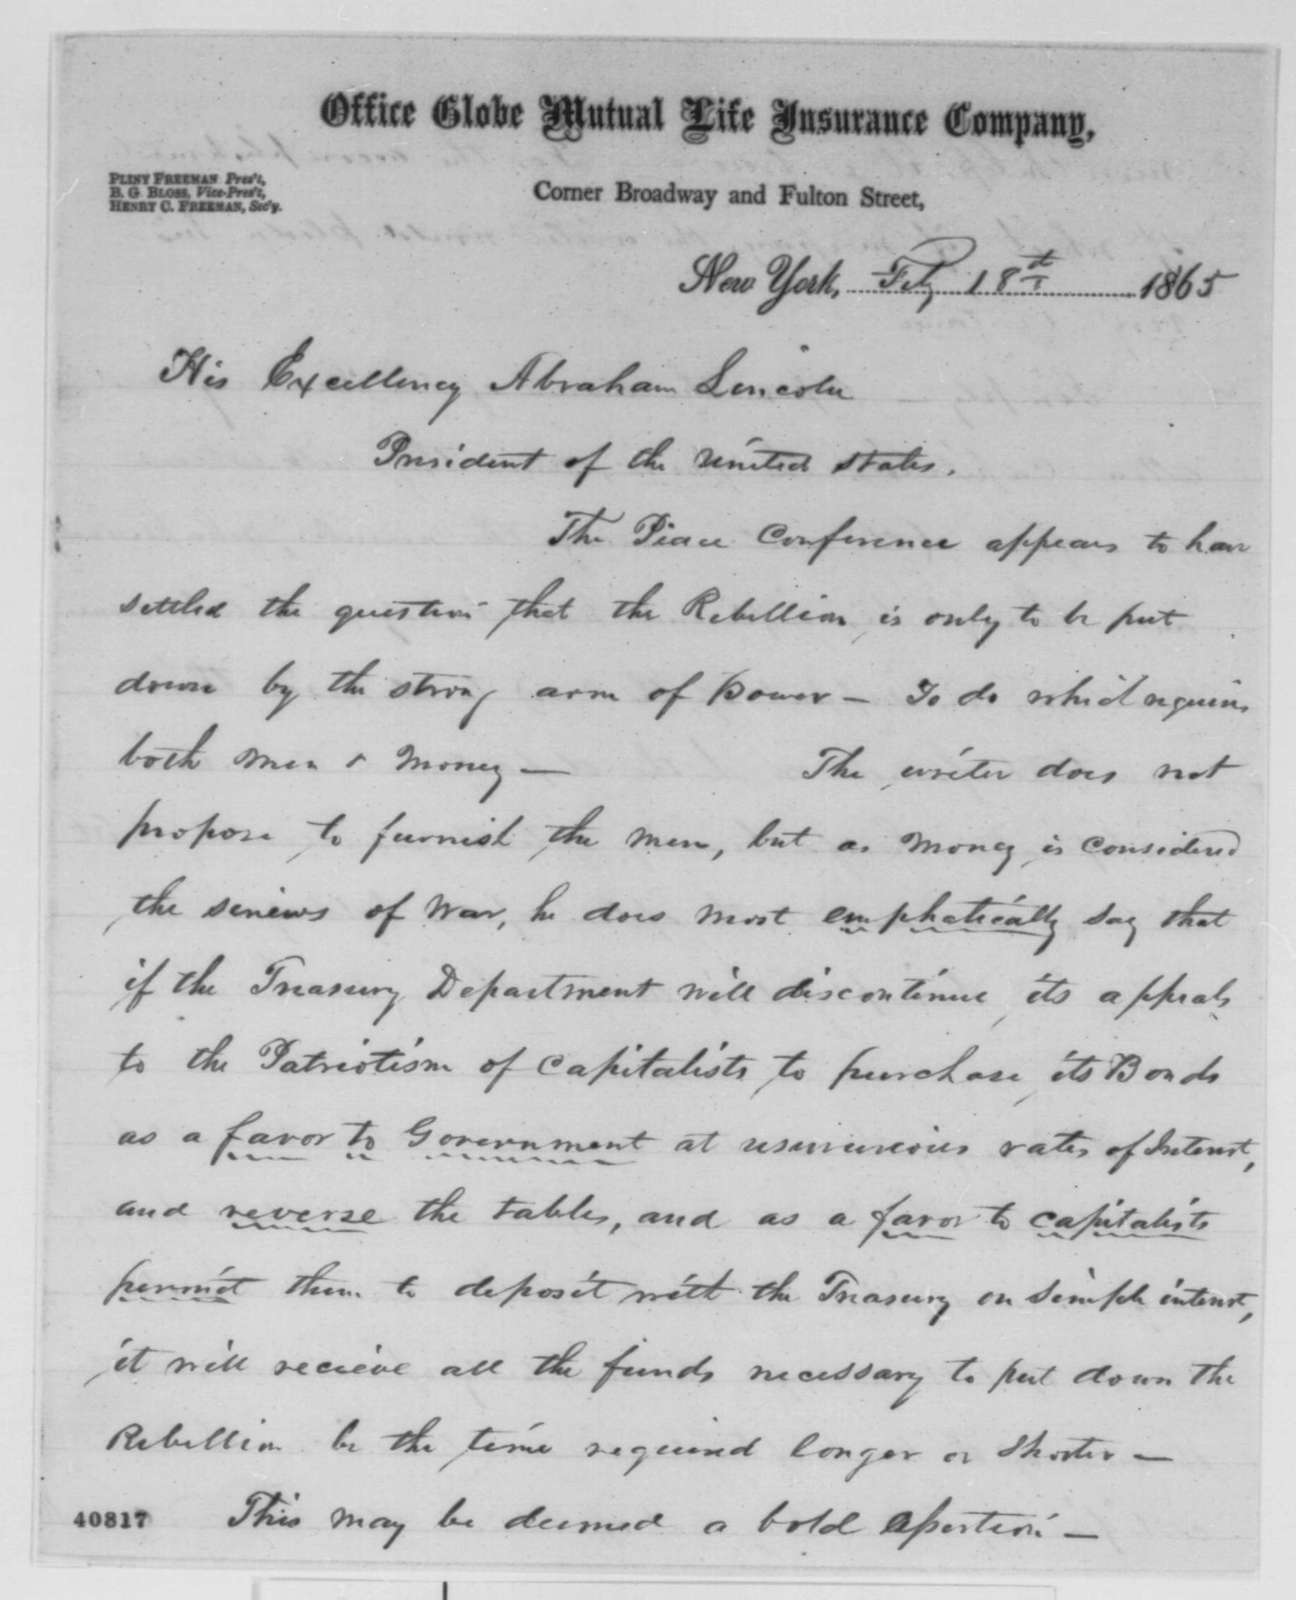 Pliny Freeman to Abraham Lincoln, Saturday, February 18, 1865  (Financial affairs)